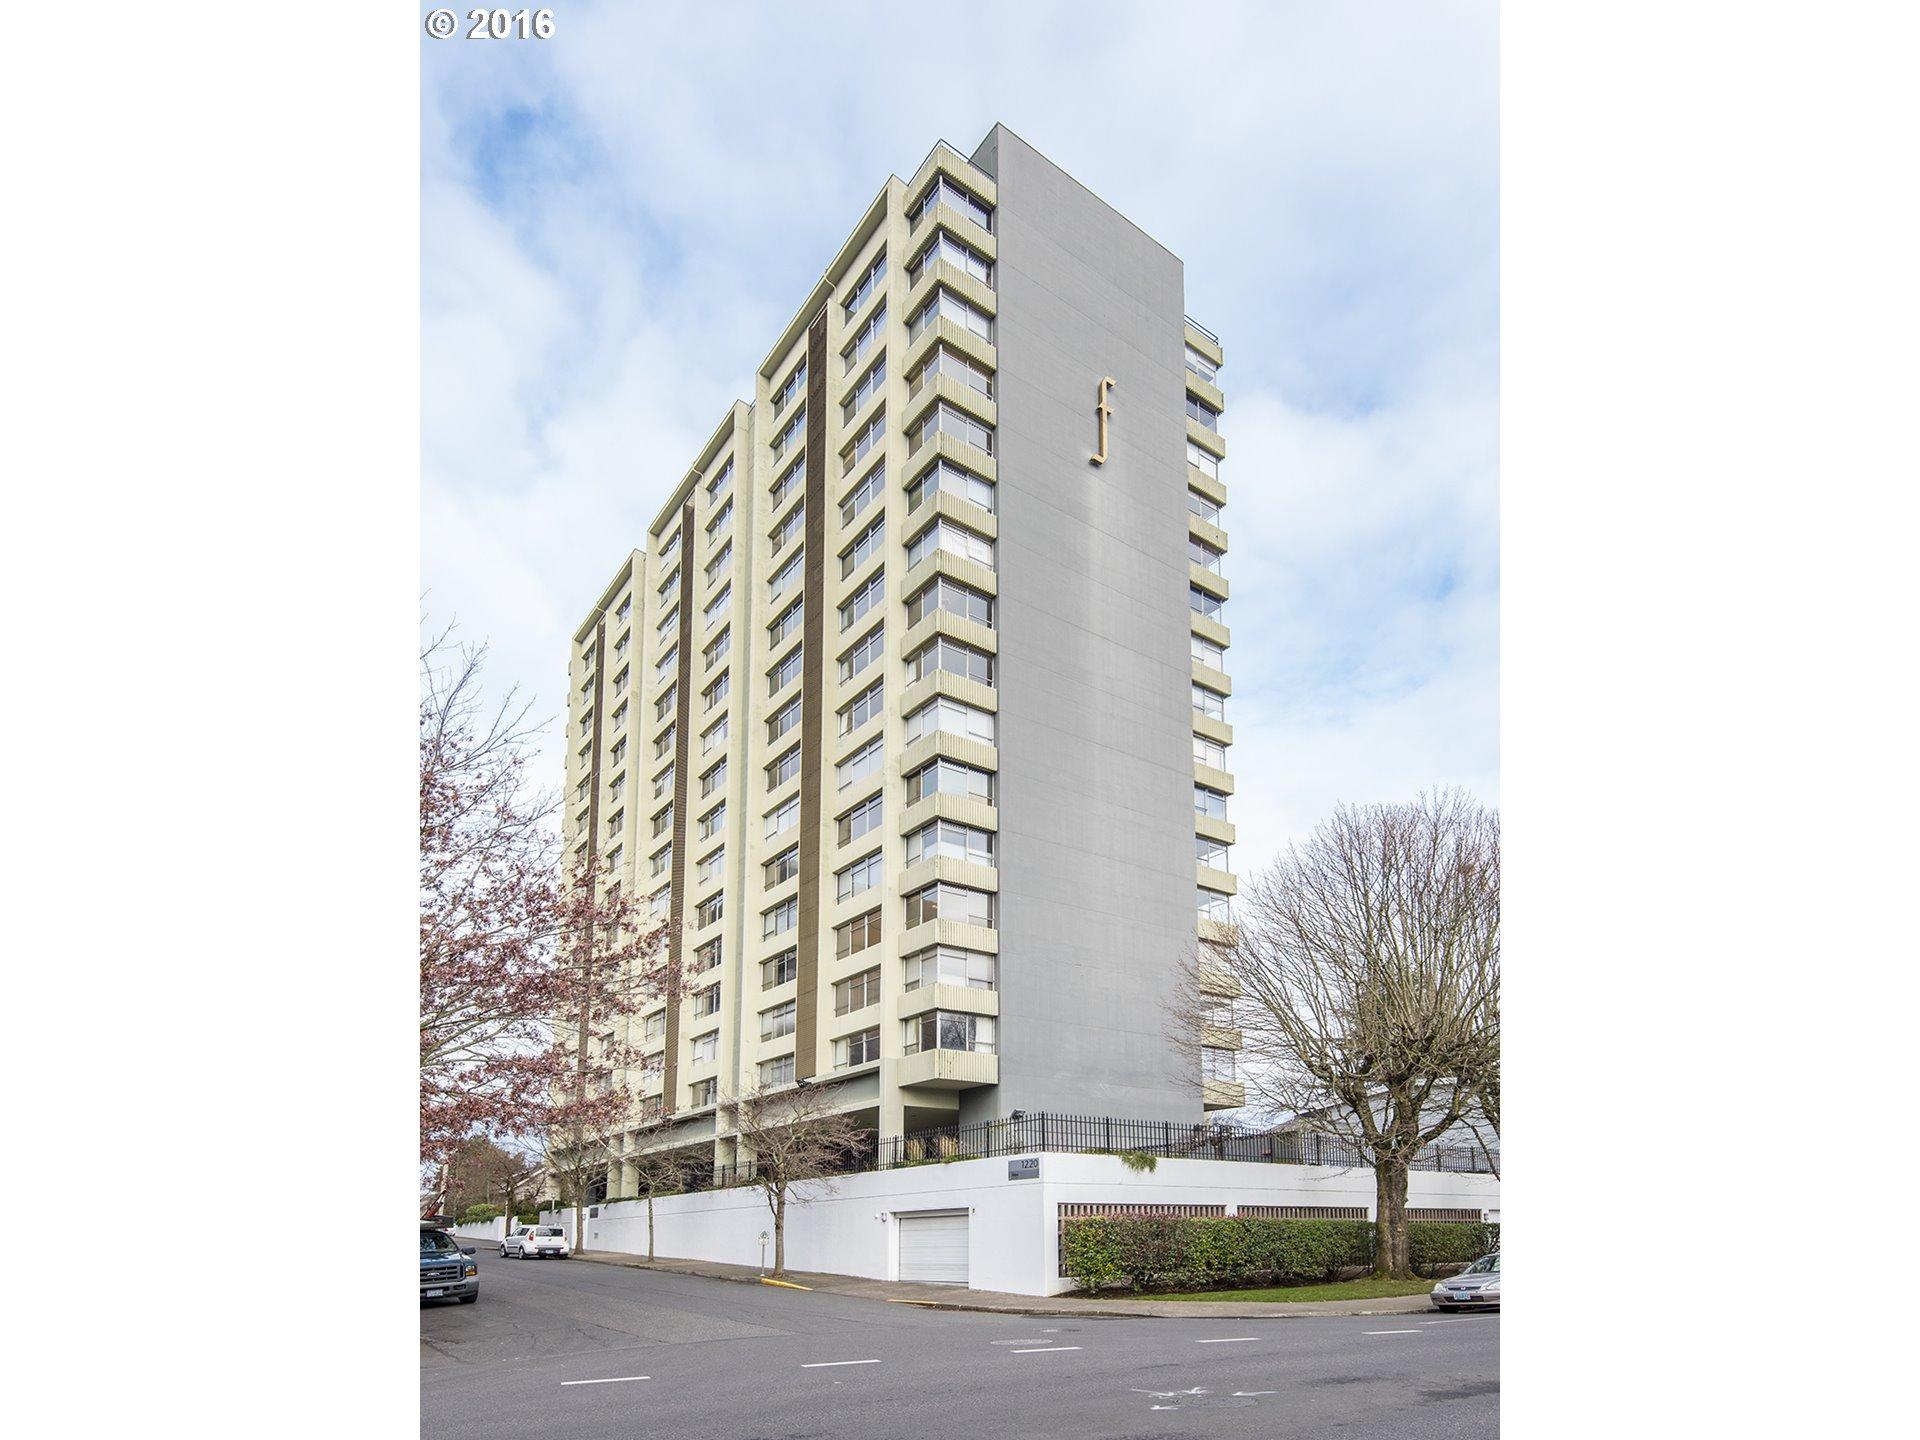 1220 NE 17TH AVE Portland, OR 97232 16210801